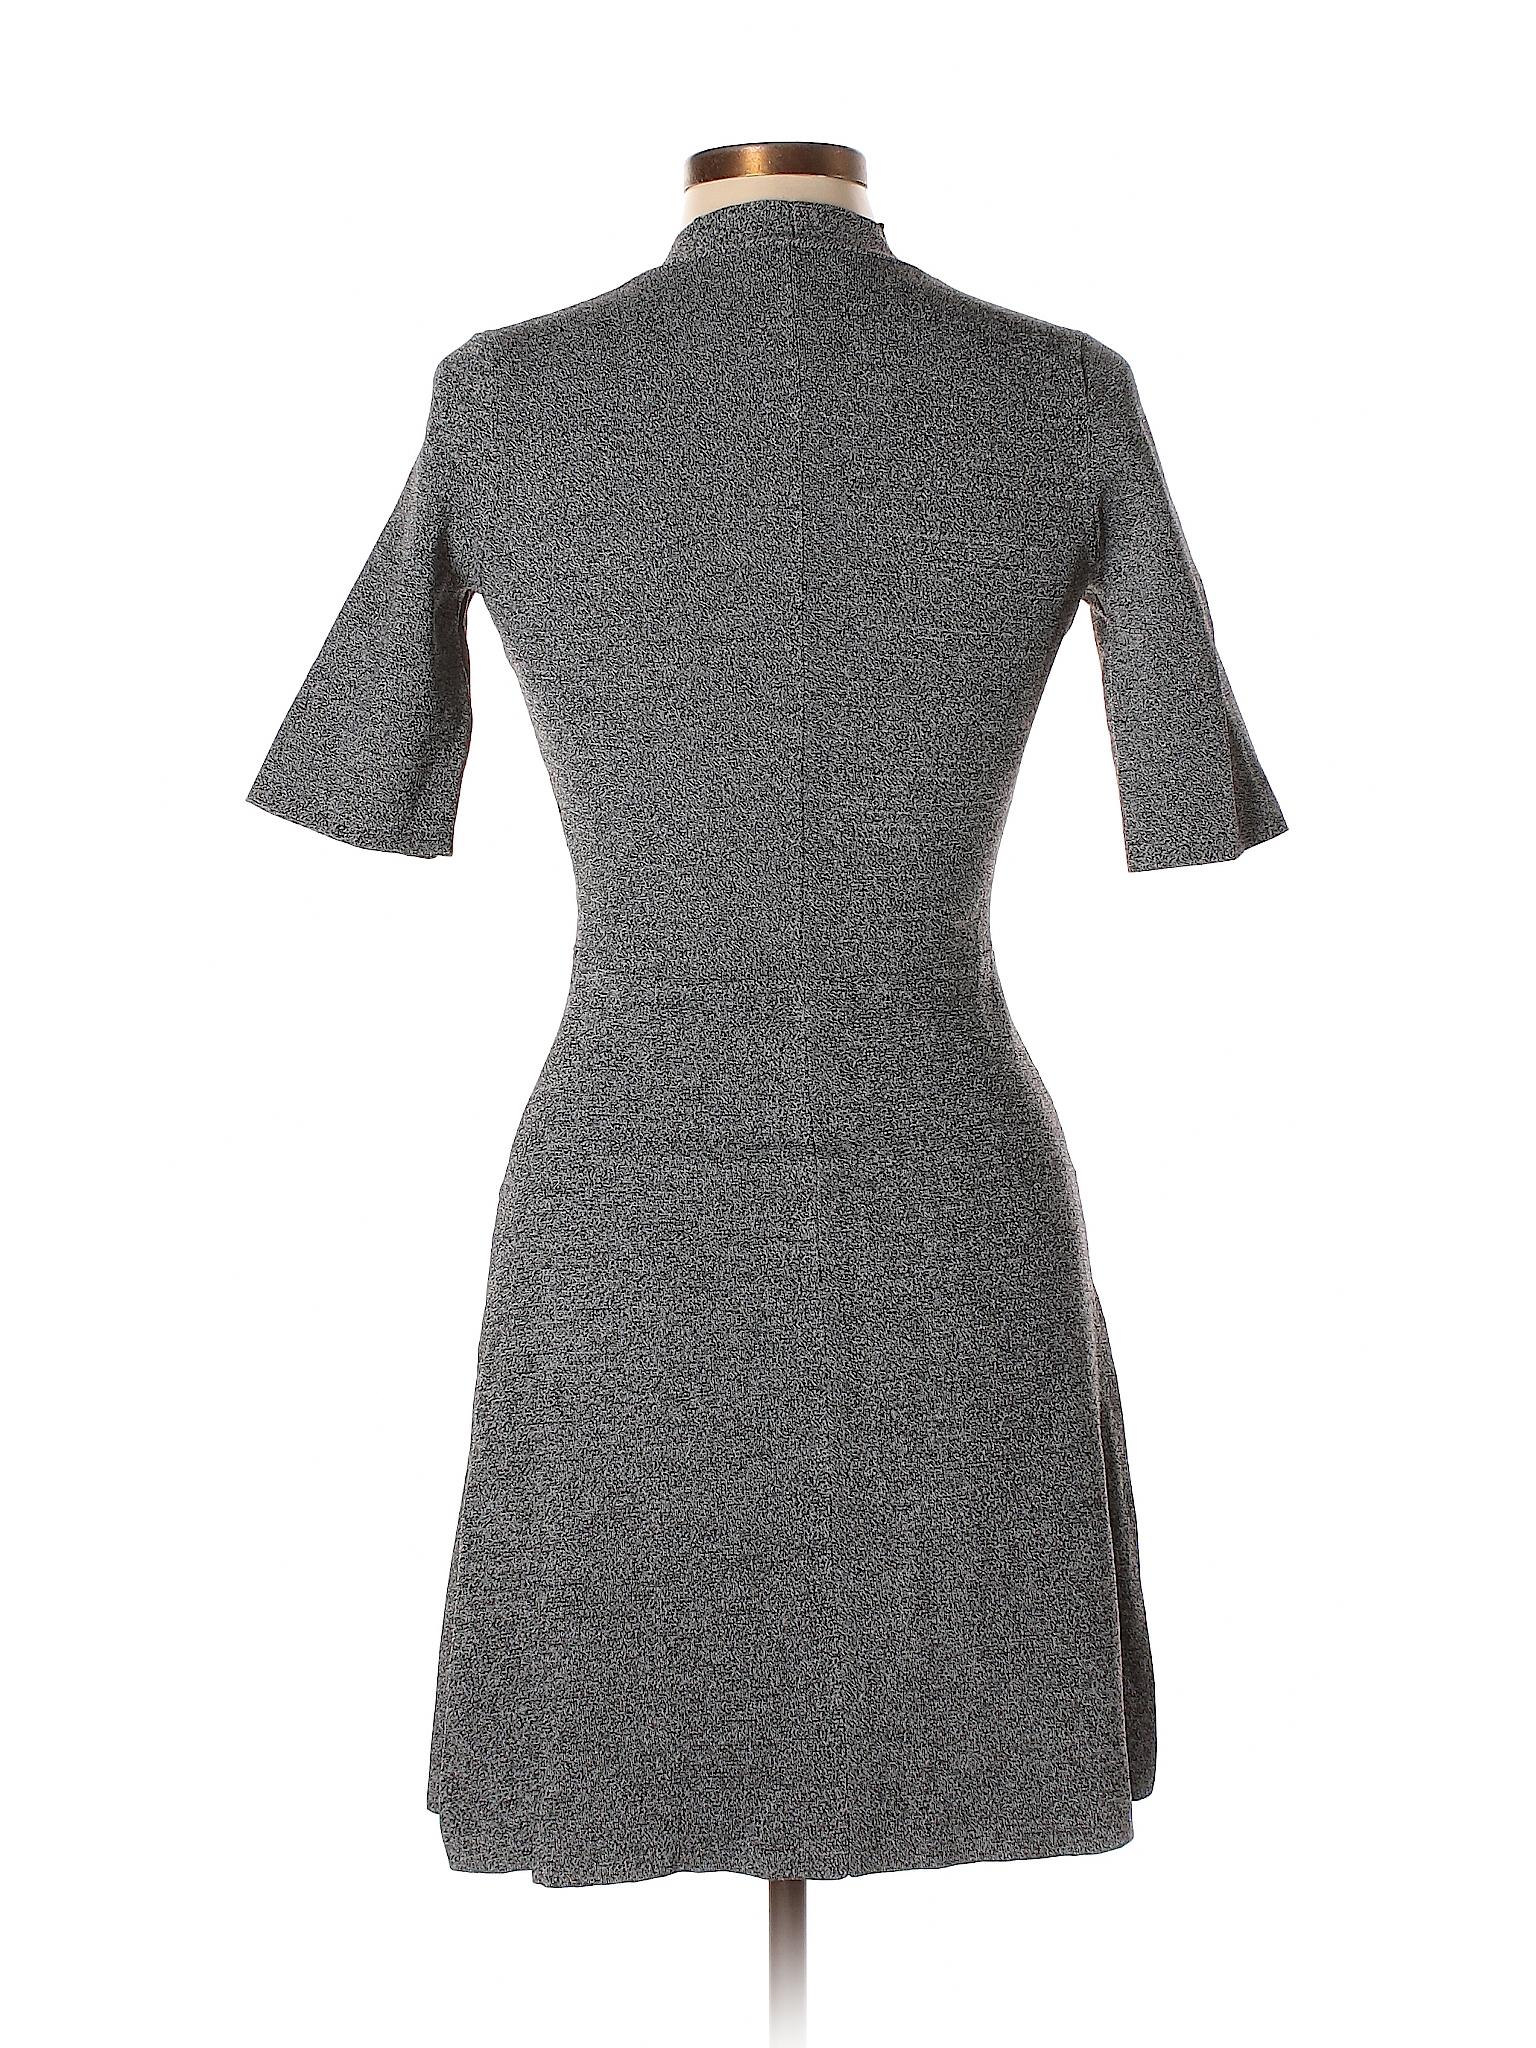 Casual Dress Winter Ann Taylor Boutique zPwx6Z0qW